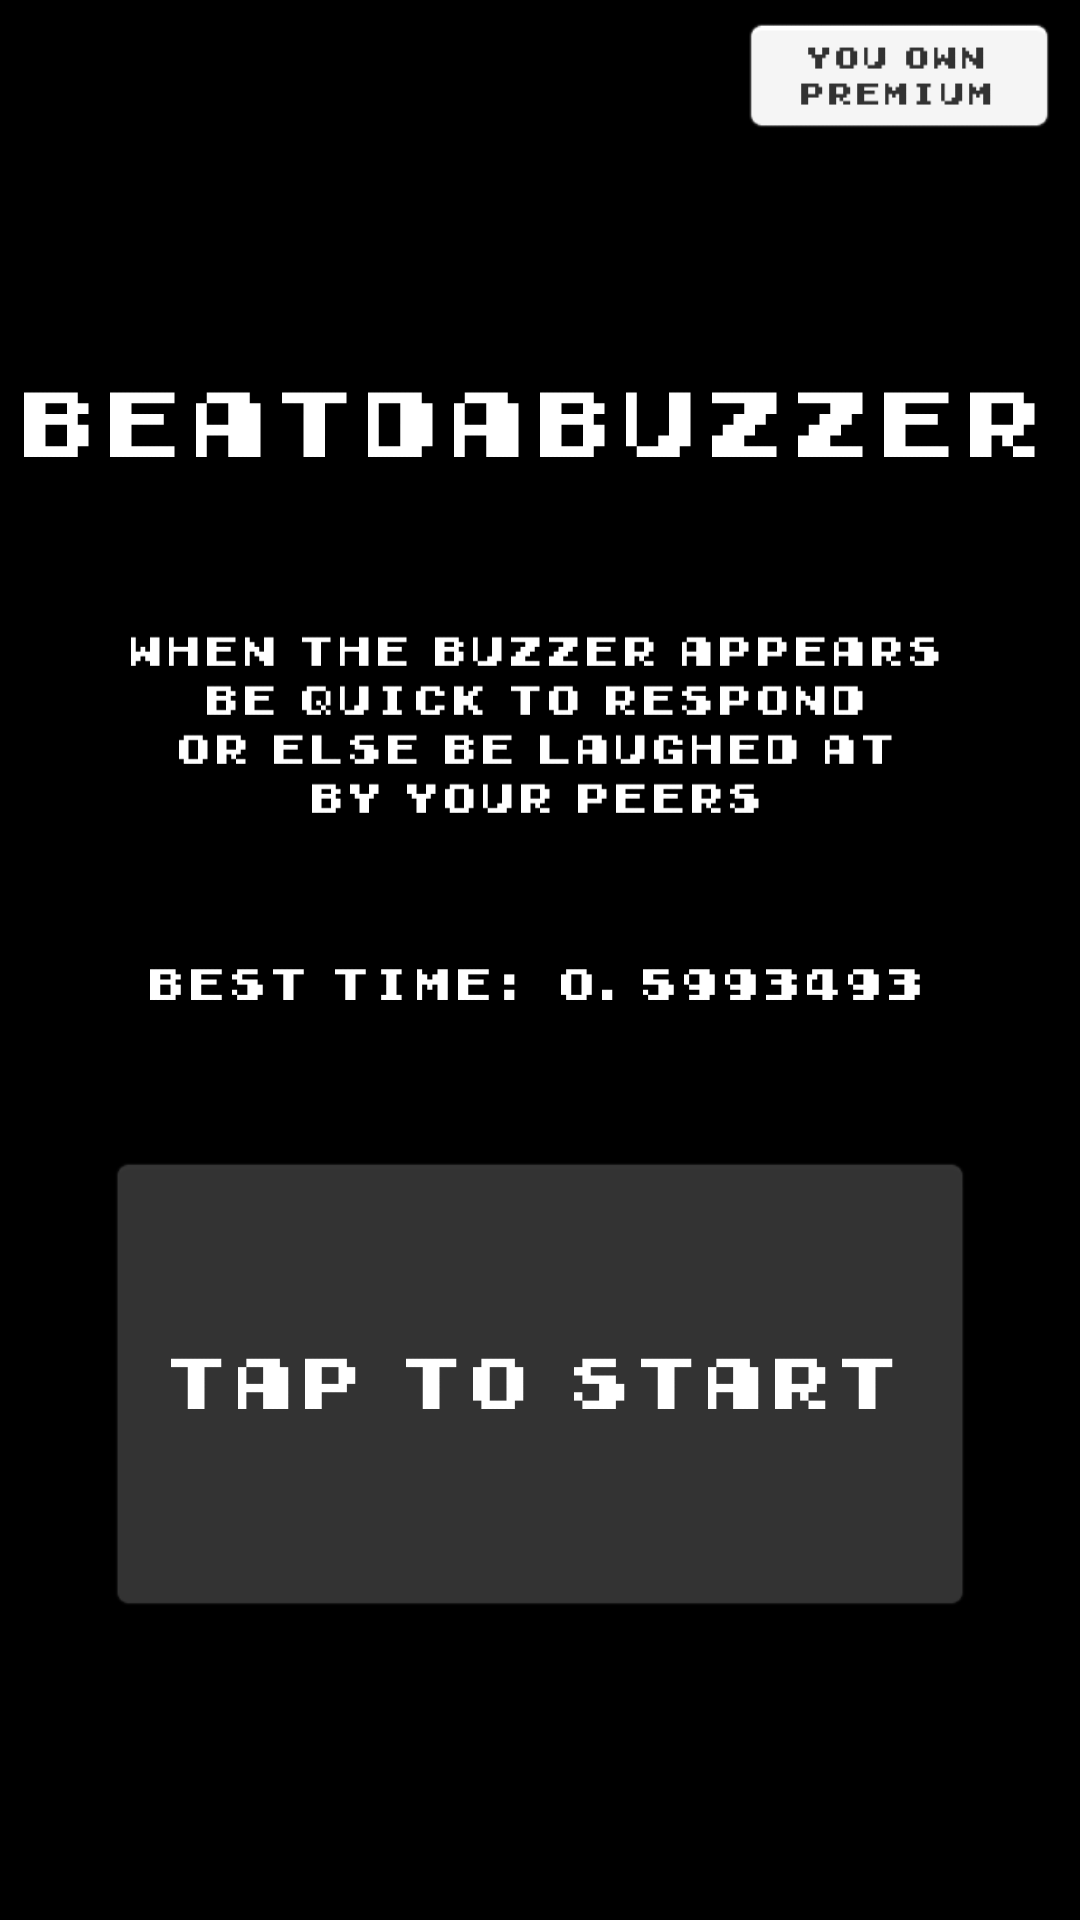 BeatDaBuzzer